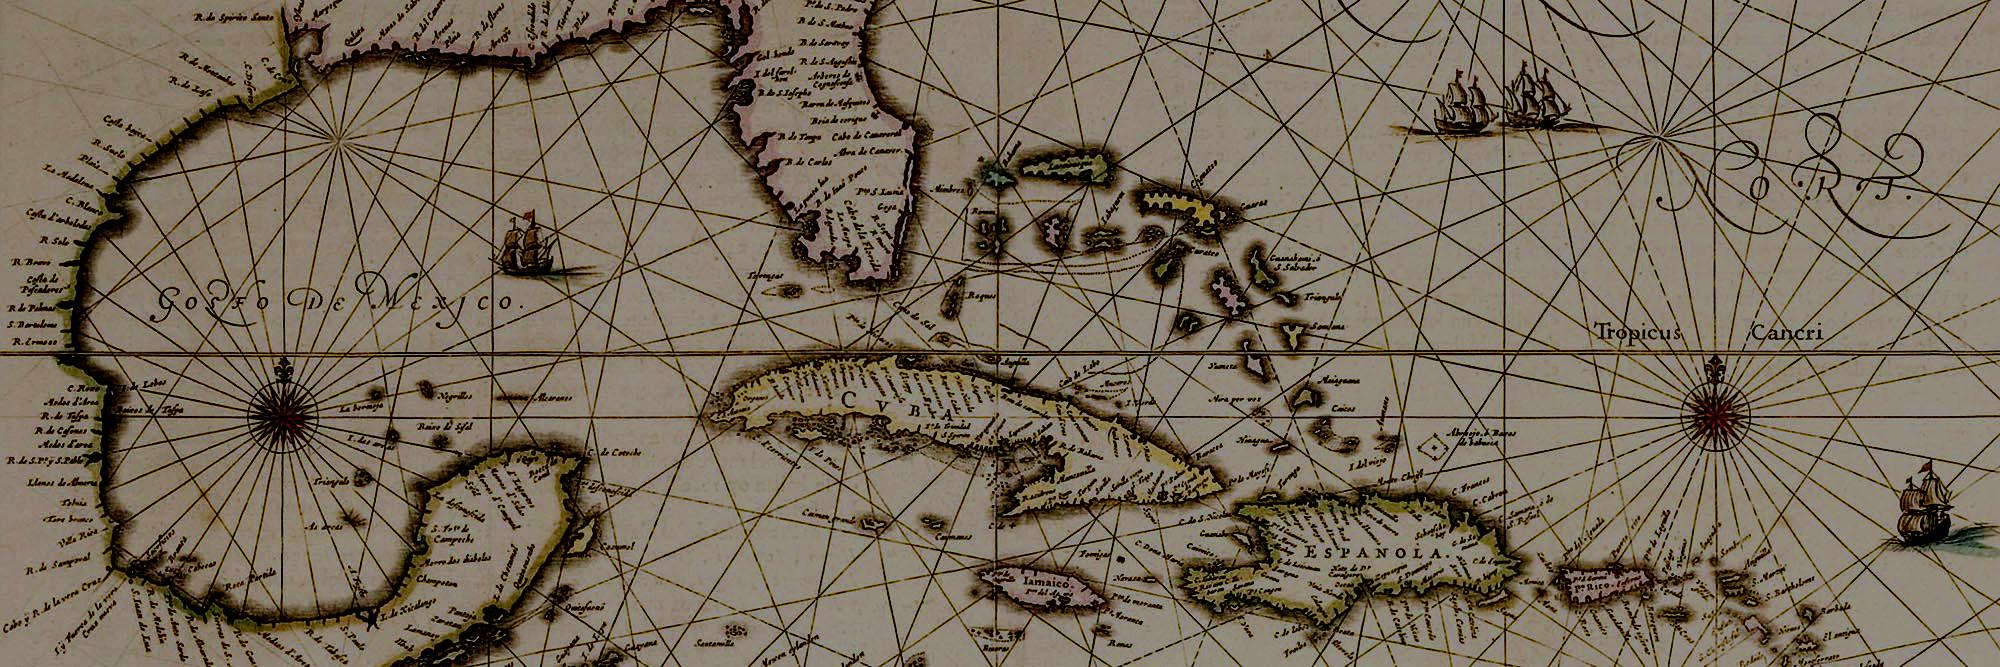 carribean map